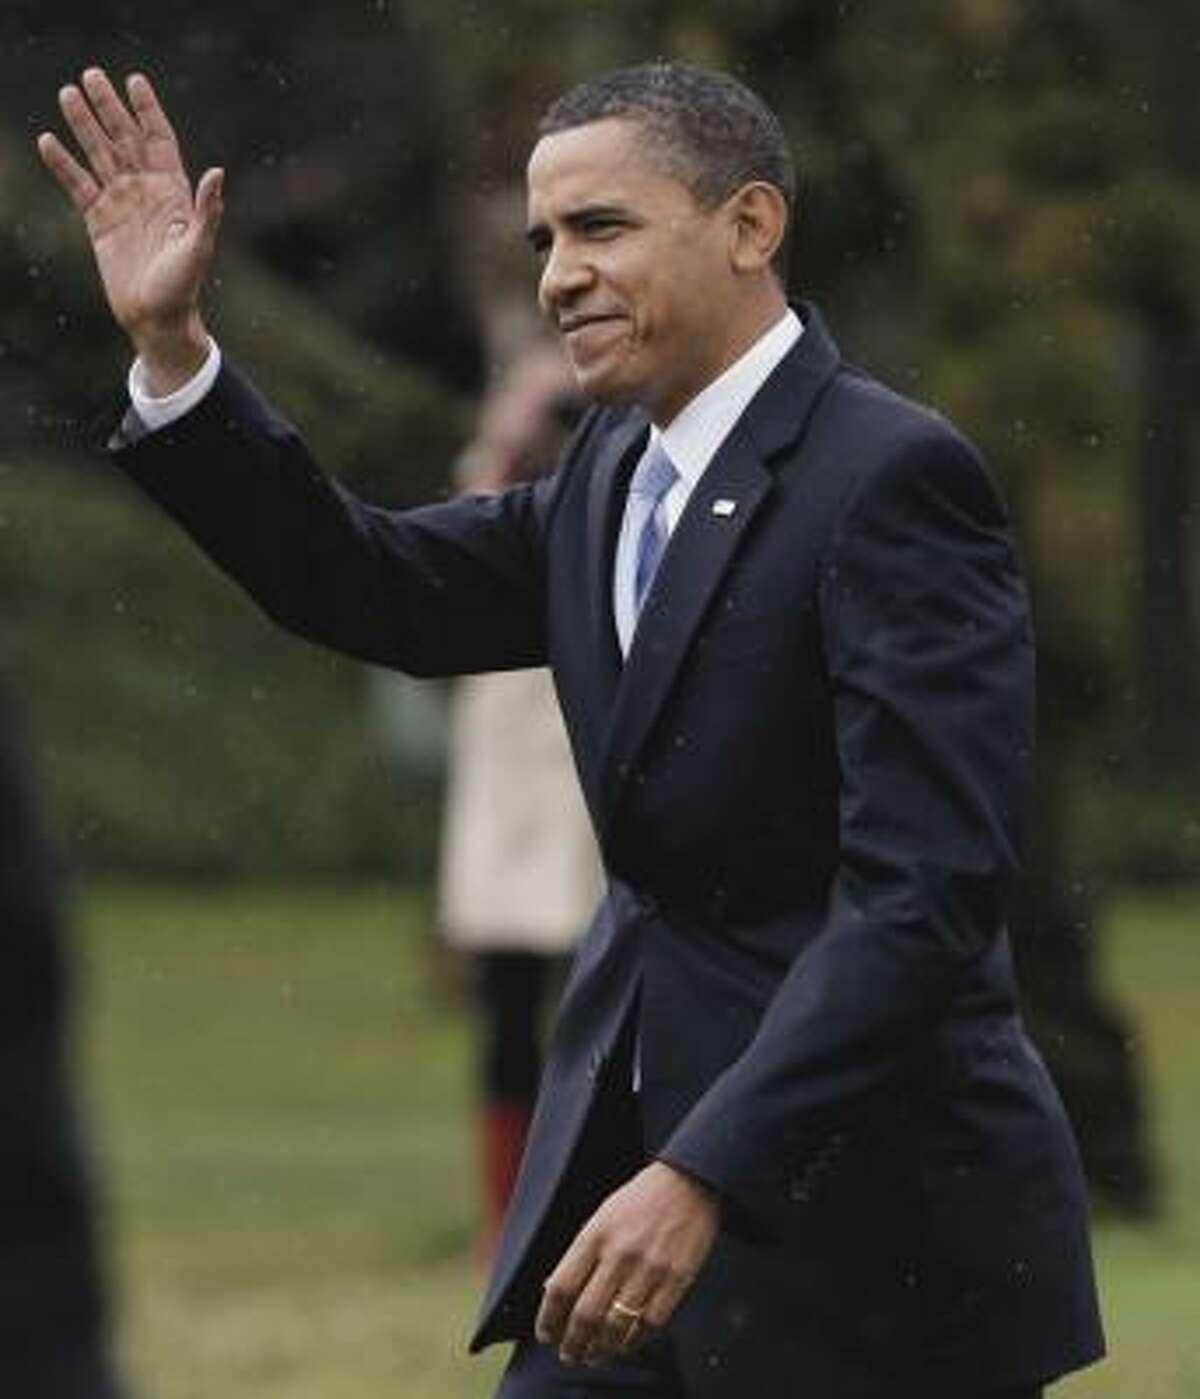 President Barack Obama walks through a light rain as he departs the White House.